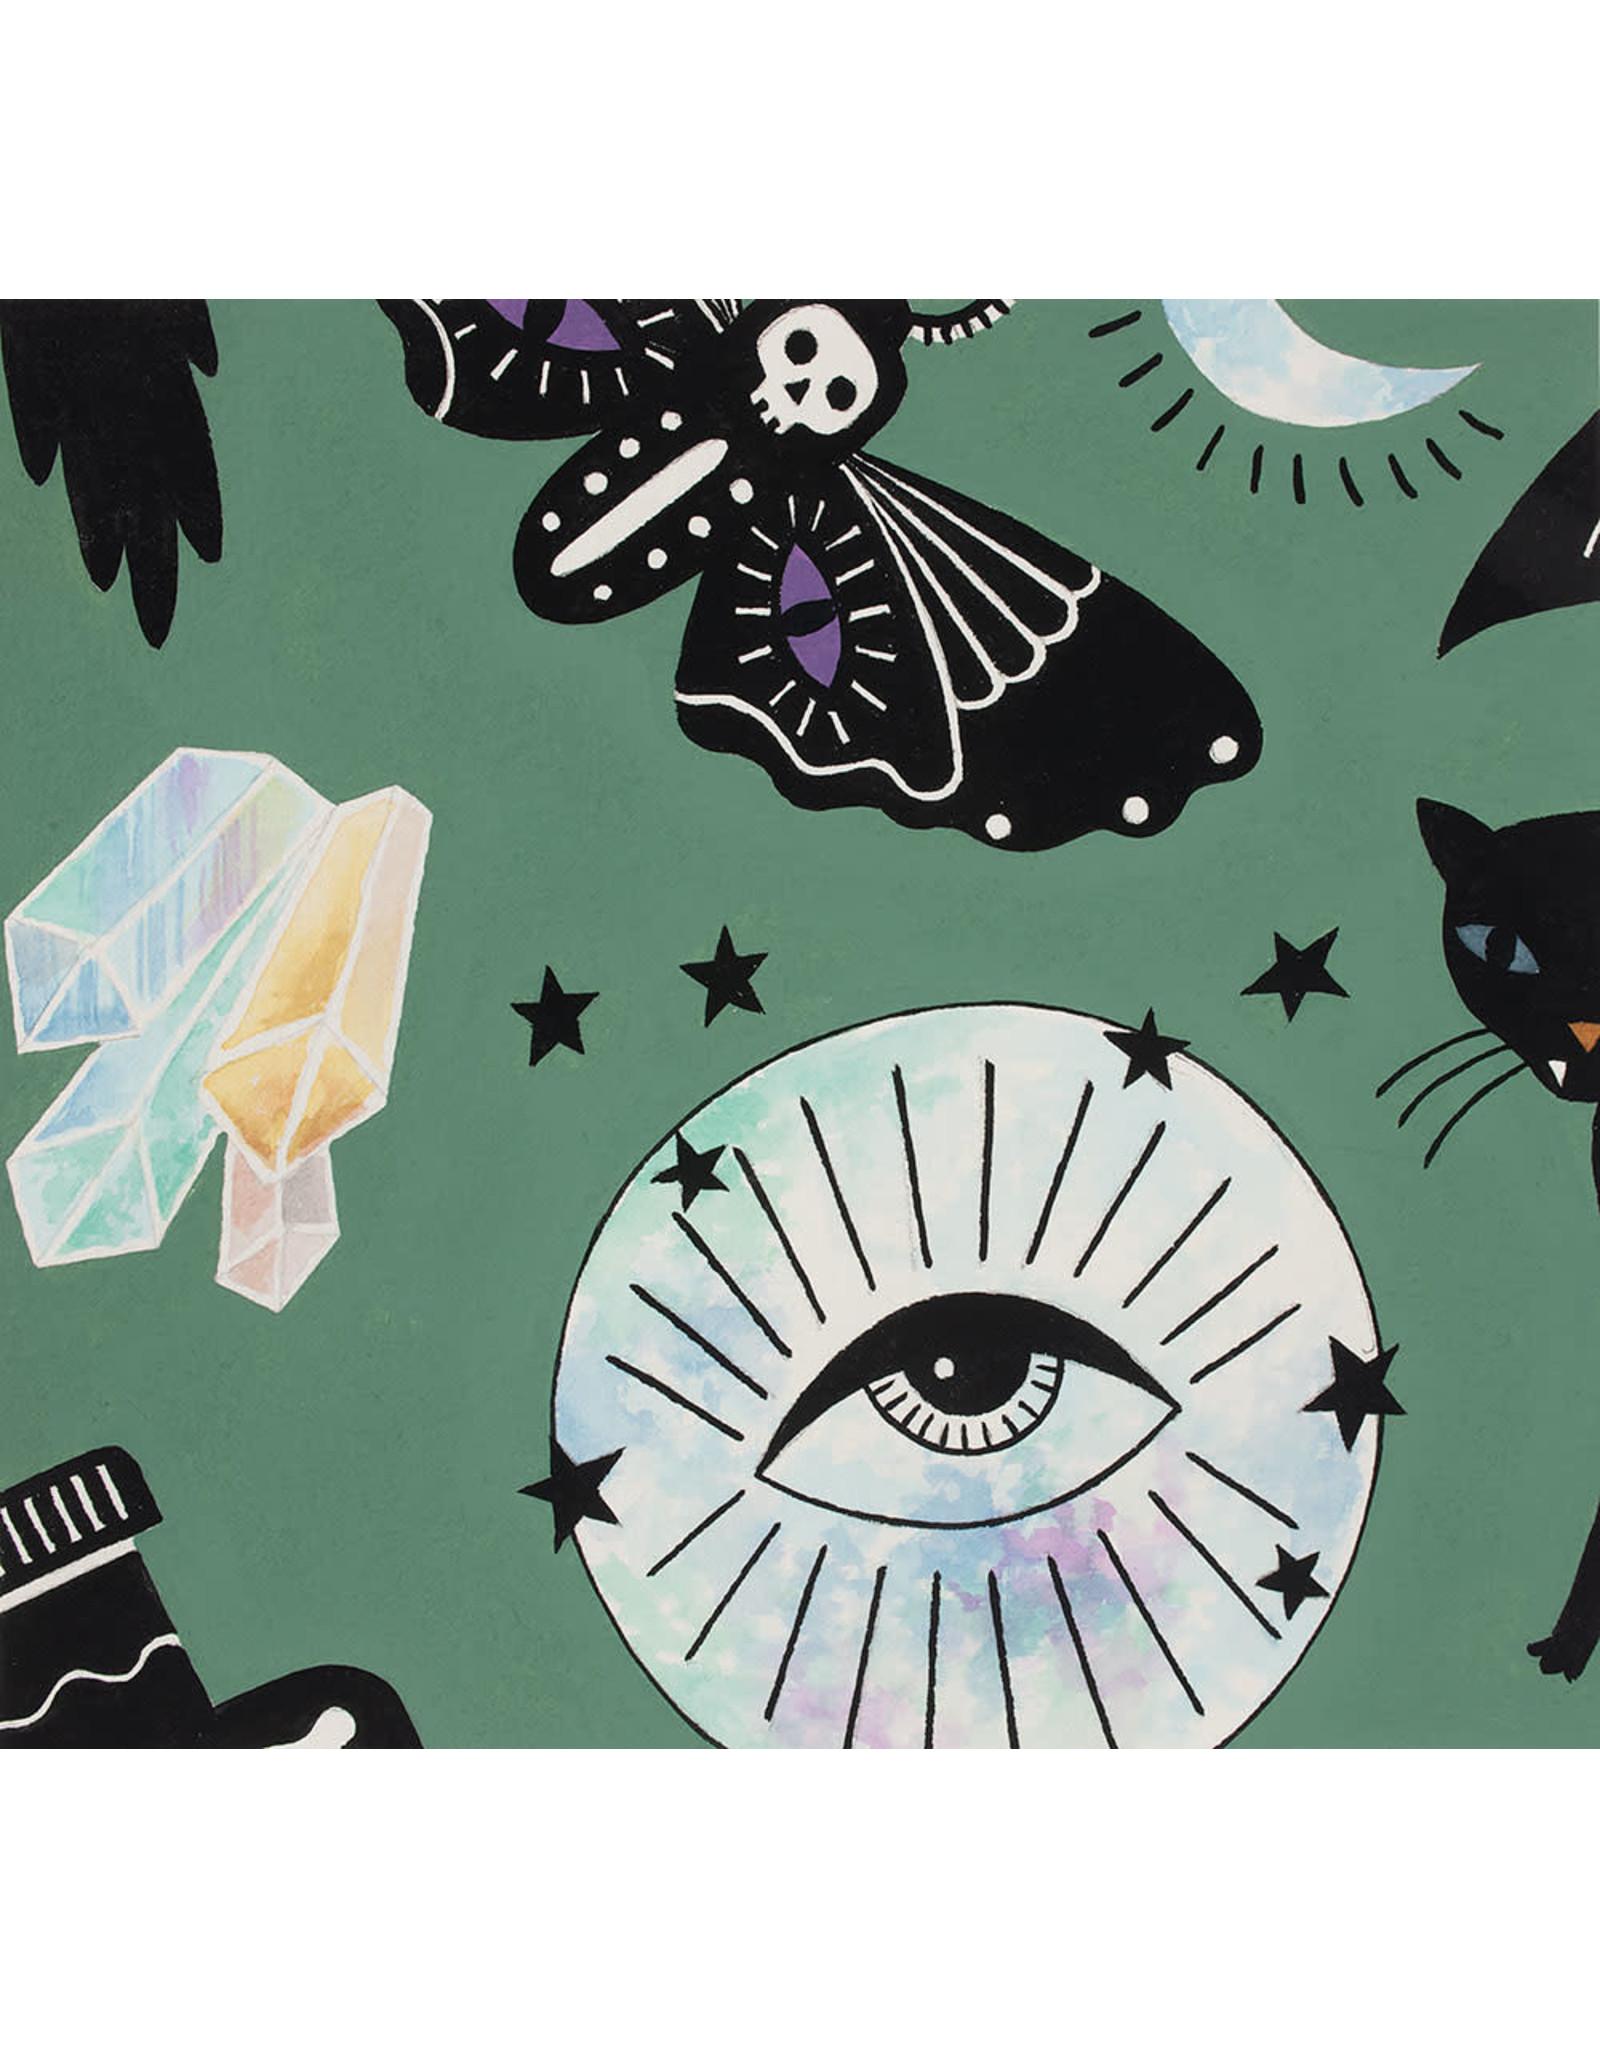 Alexander Henry Fabrics Haunted House, Eye of the Moon in Green, Fabric Half-Yards